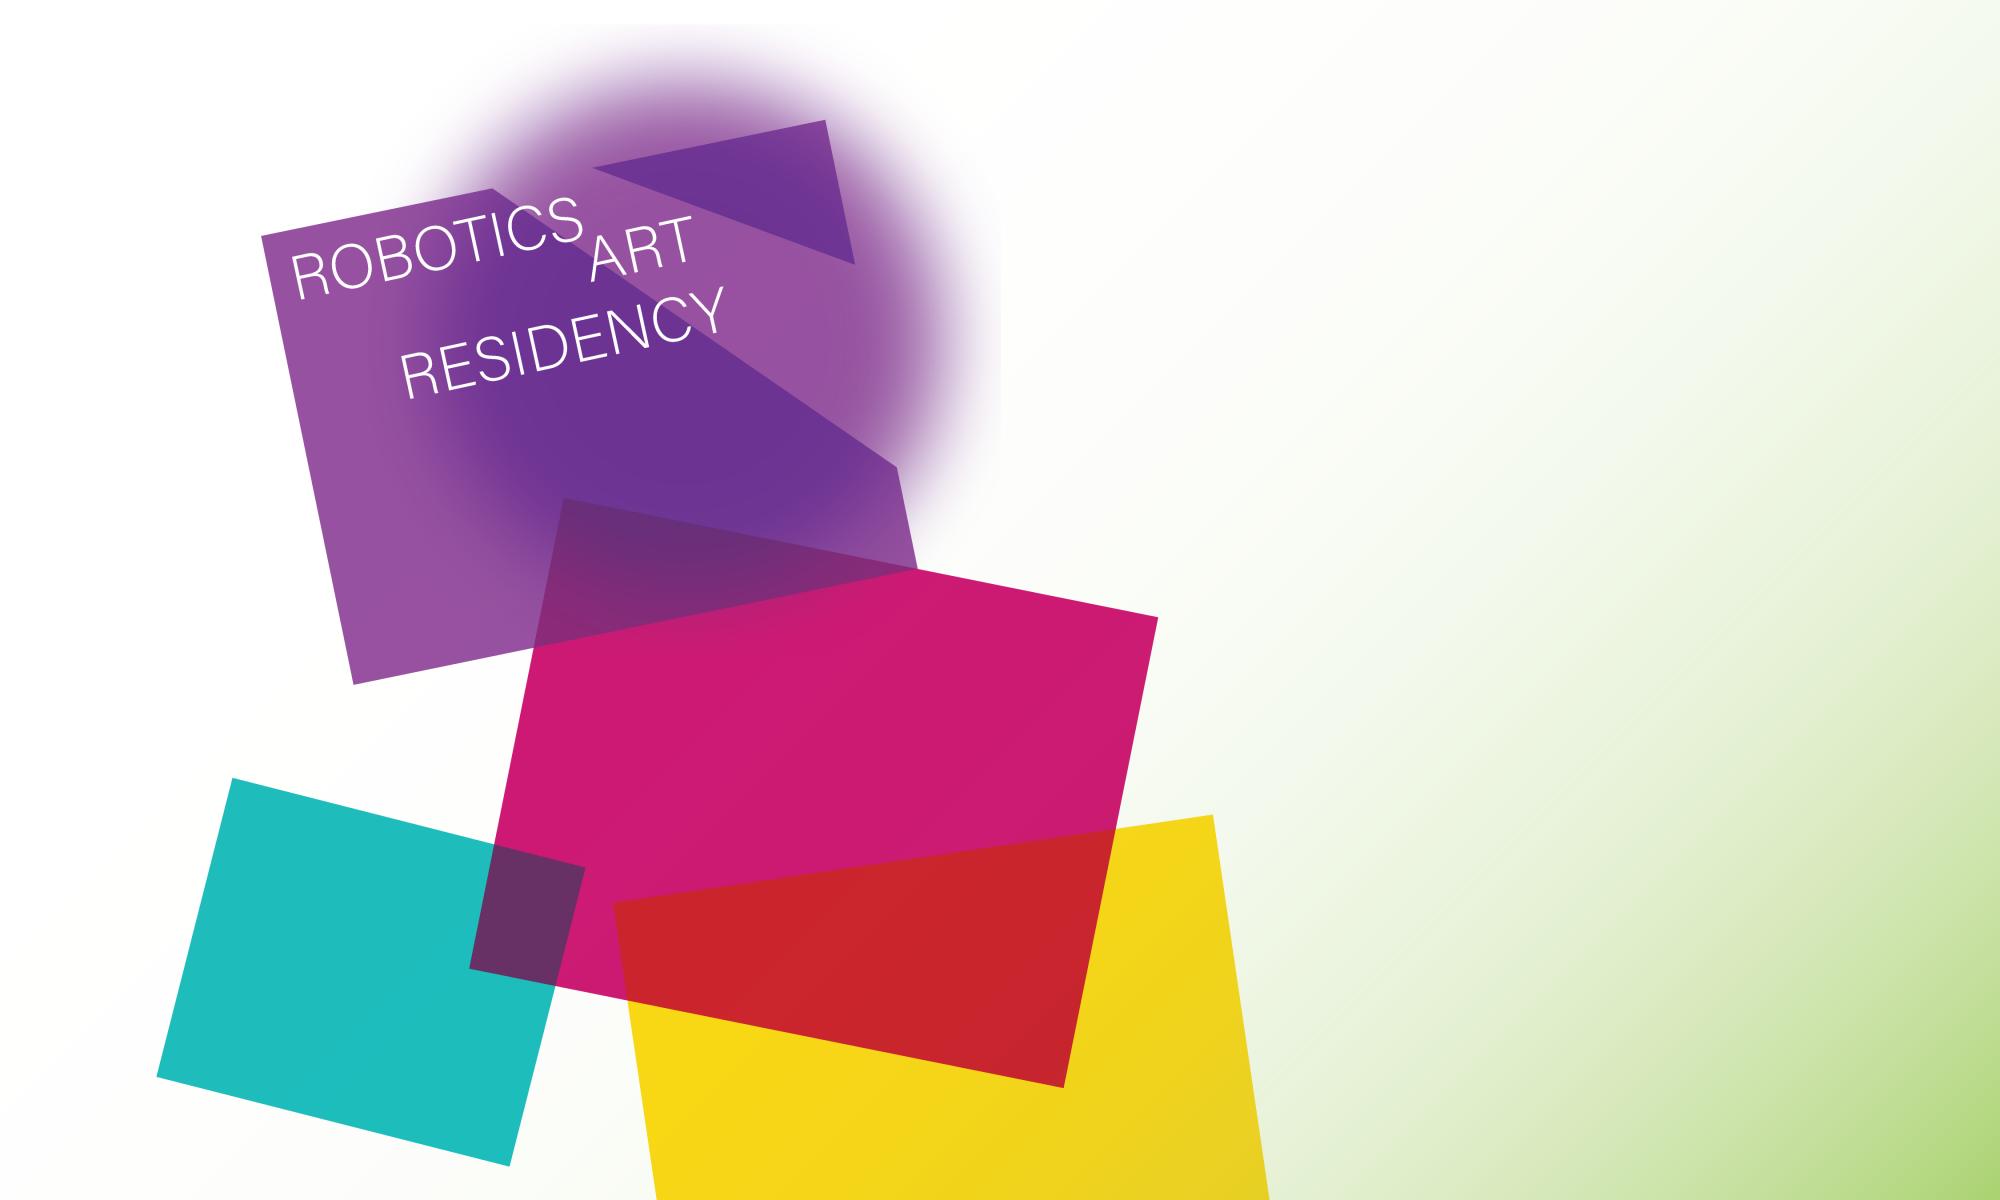 Robotics Art Residency